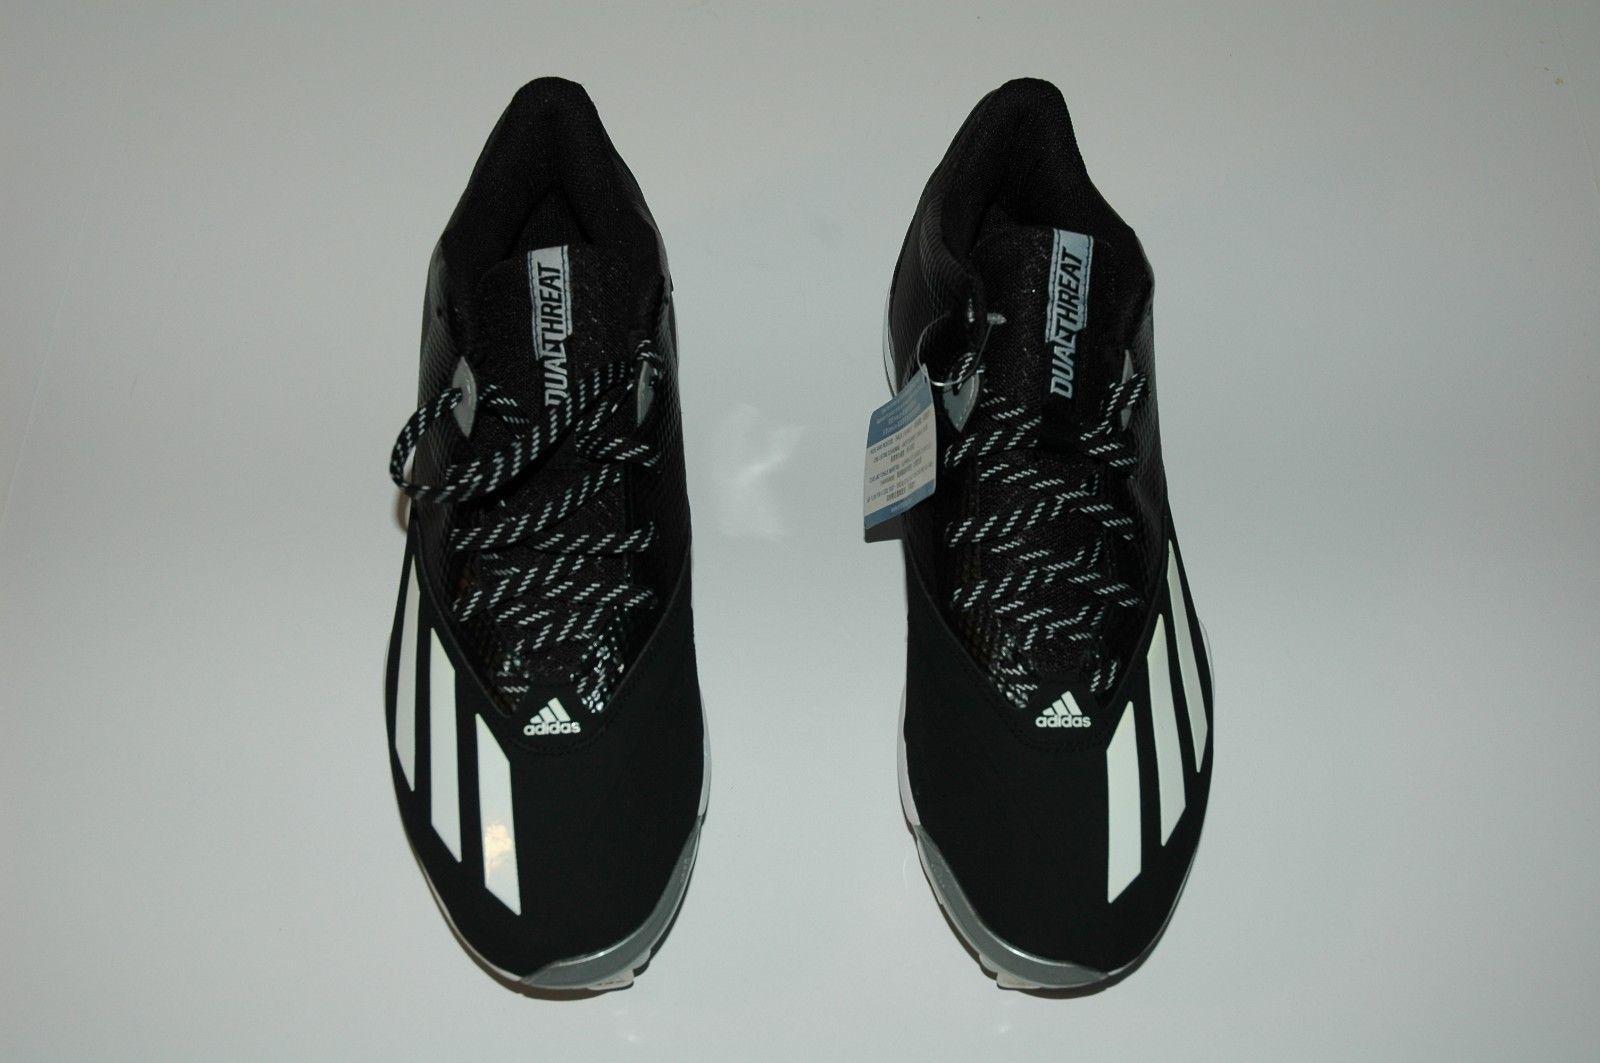 buy online 7e9af 5dfc5 http   www.prospectstrainingcenter.com cebfcruhrvzw-3699011 http ...